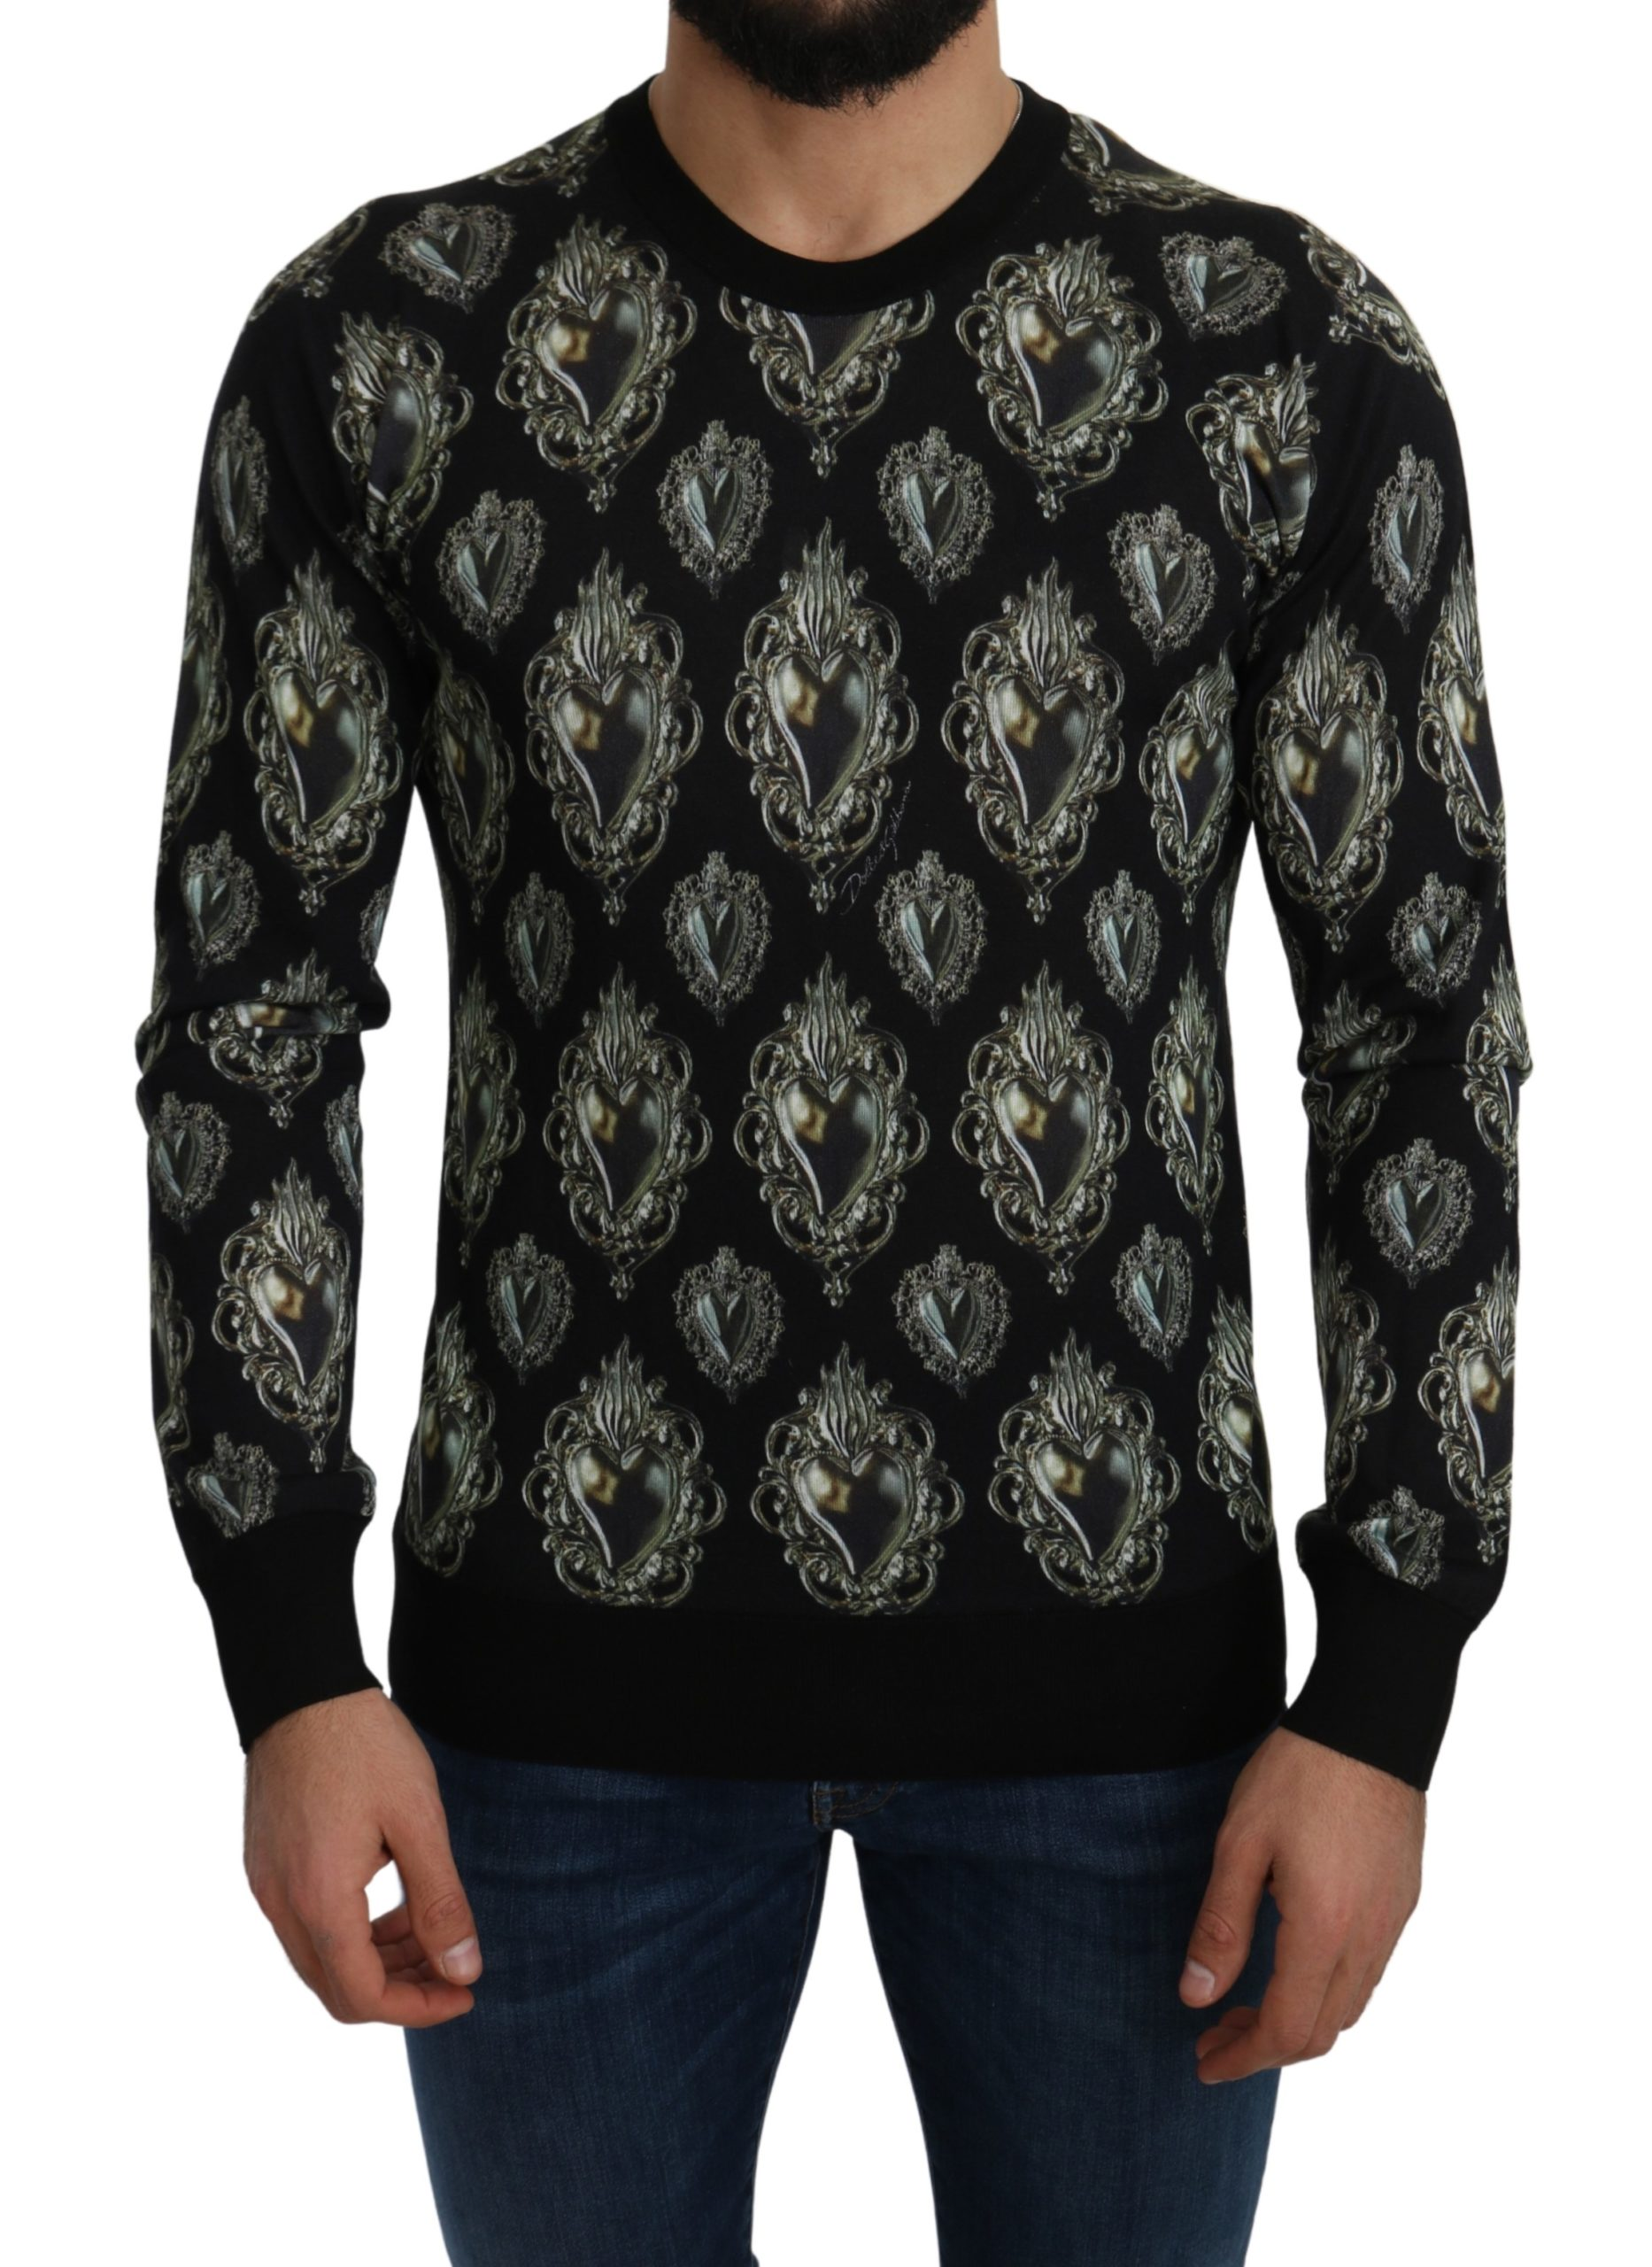 Dolce & Gabbana Women's Silk Heart Pullover Sweater Black TSH5151 - IT52   XL